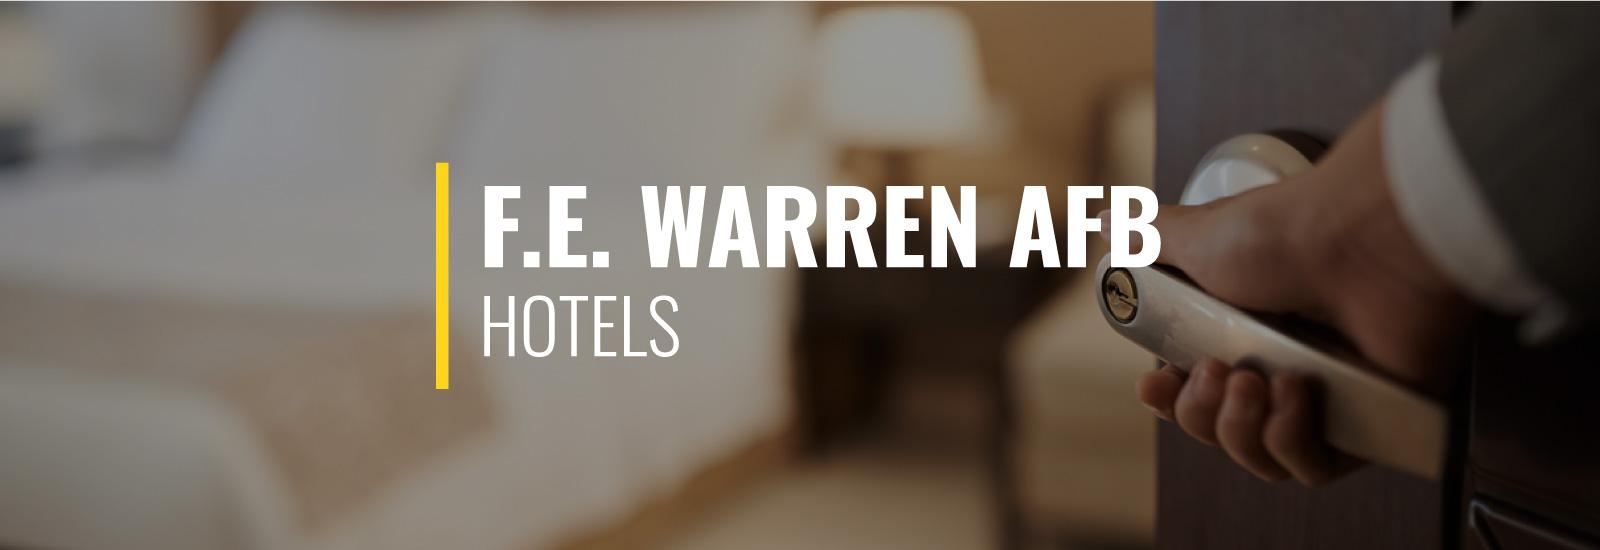 Hotels Near F. E. Warren AFB